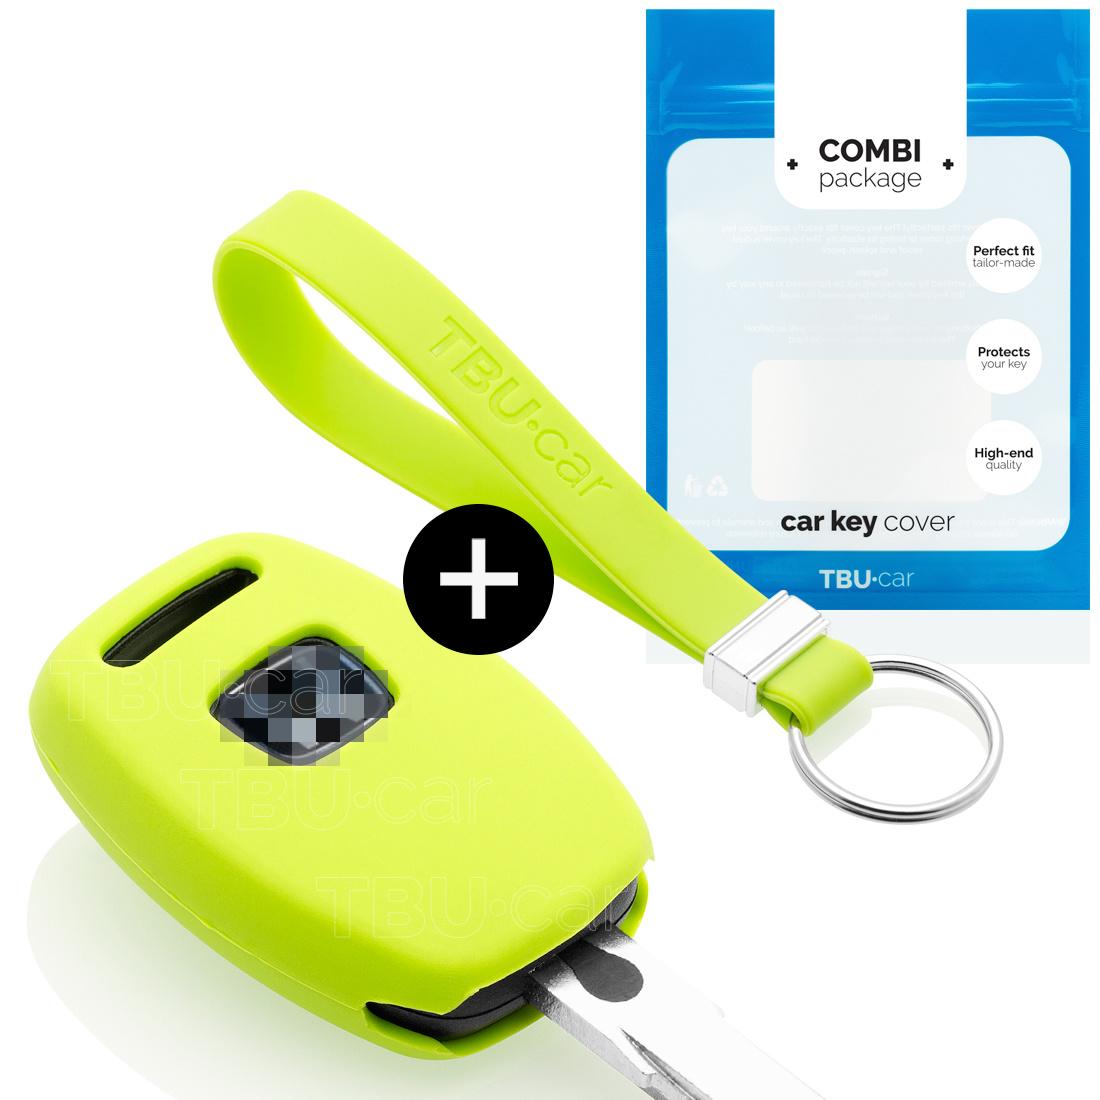 TBU car TBU car Sleutel cover compatibel met Honda - Silicone sleutelhoesje - beschermhoesje autosleutel - Lime groen